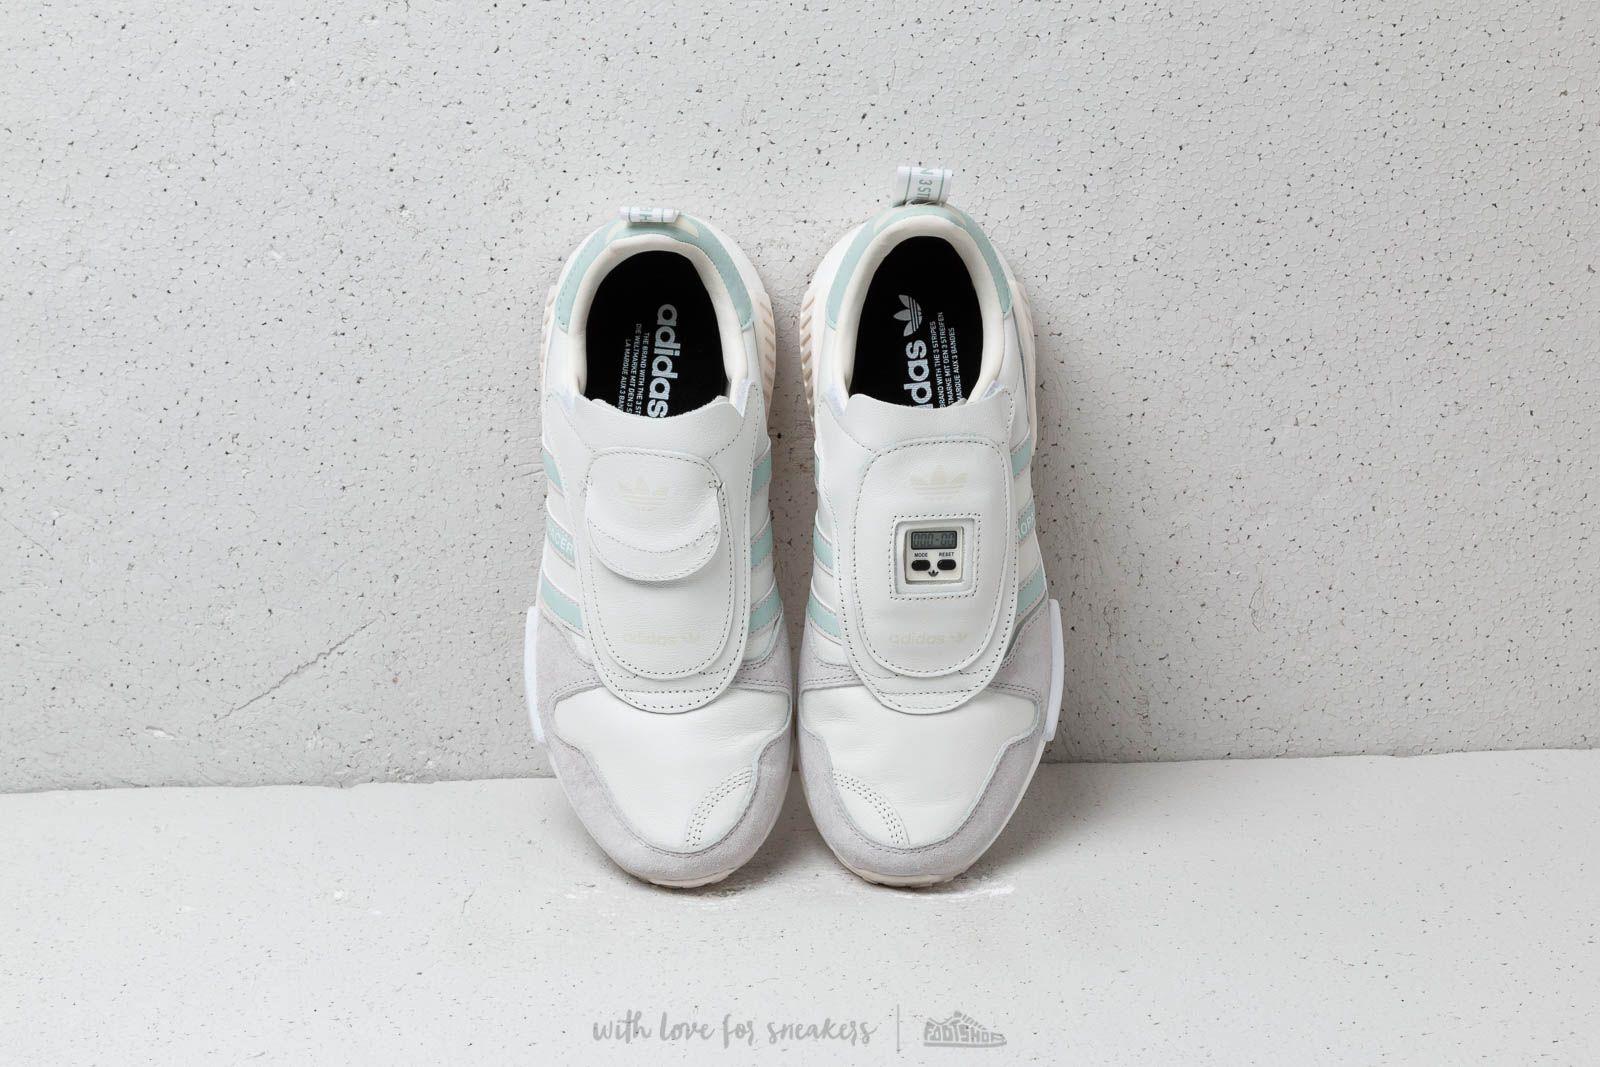 Adidas Originals Cipő Outlet Adidas 98 x Crazy BYW Férfi